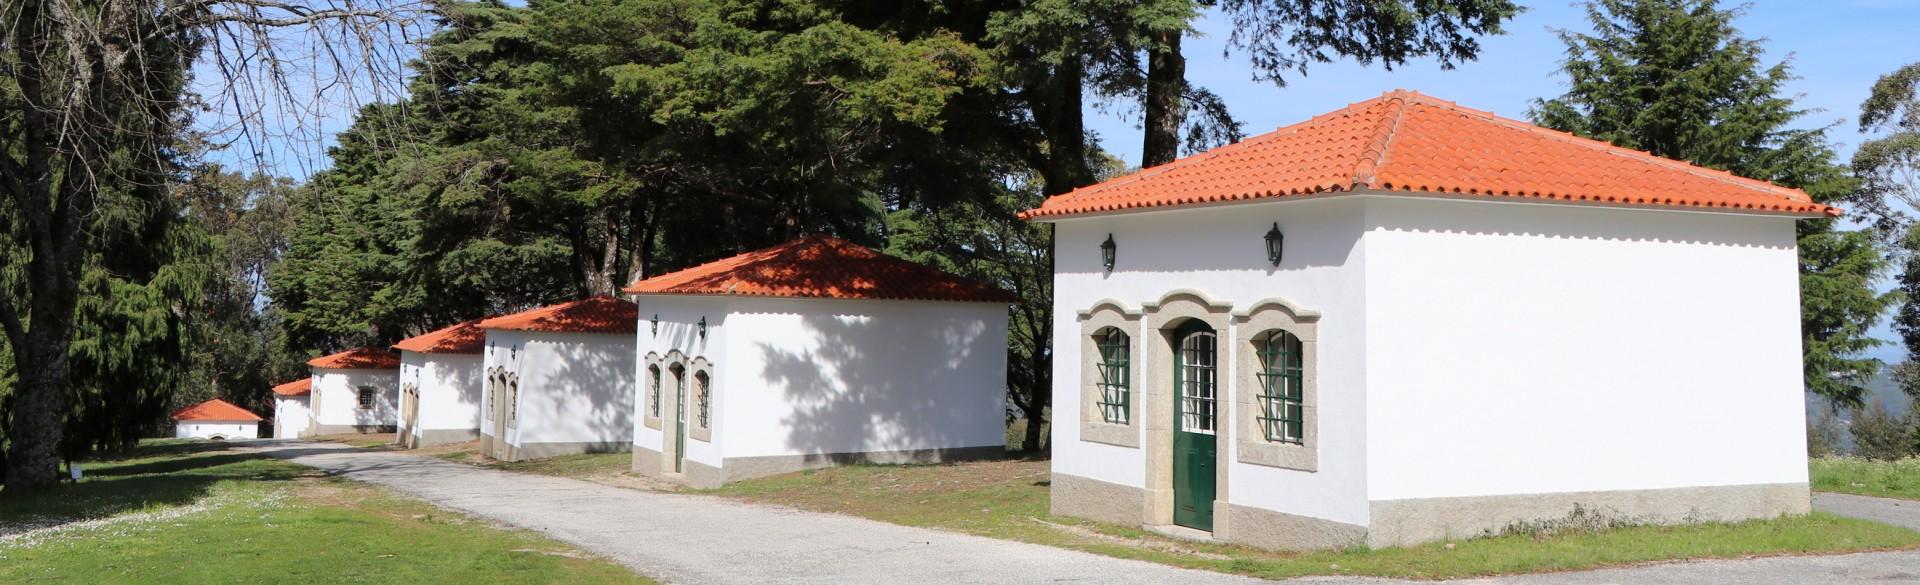 Casa da Eira de Cima